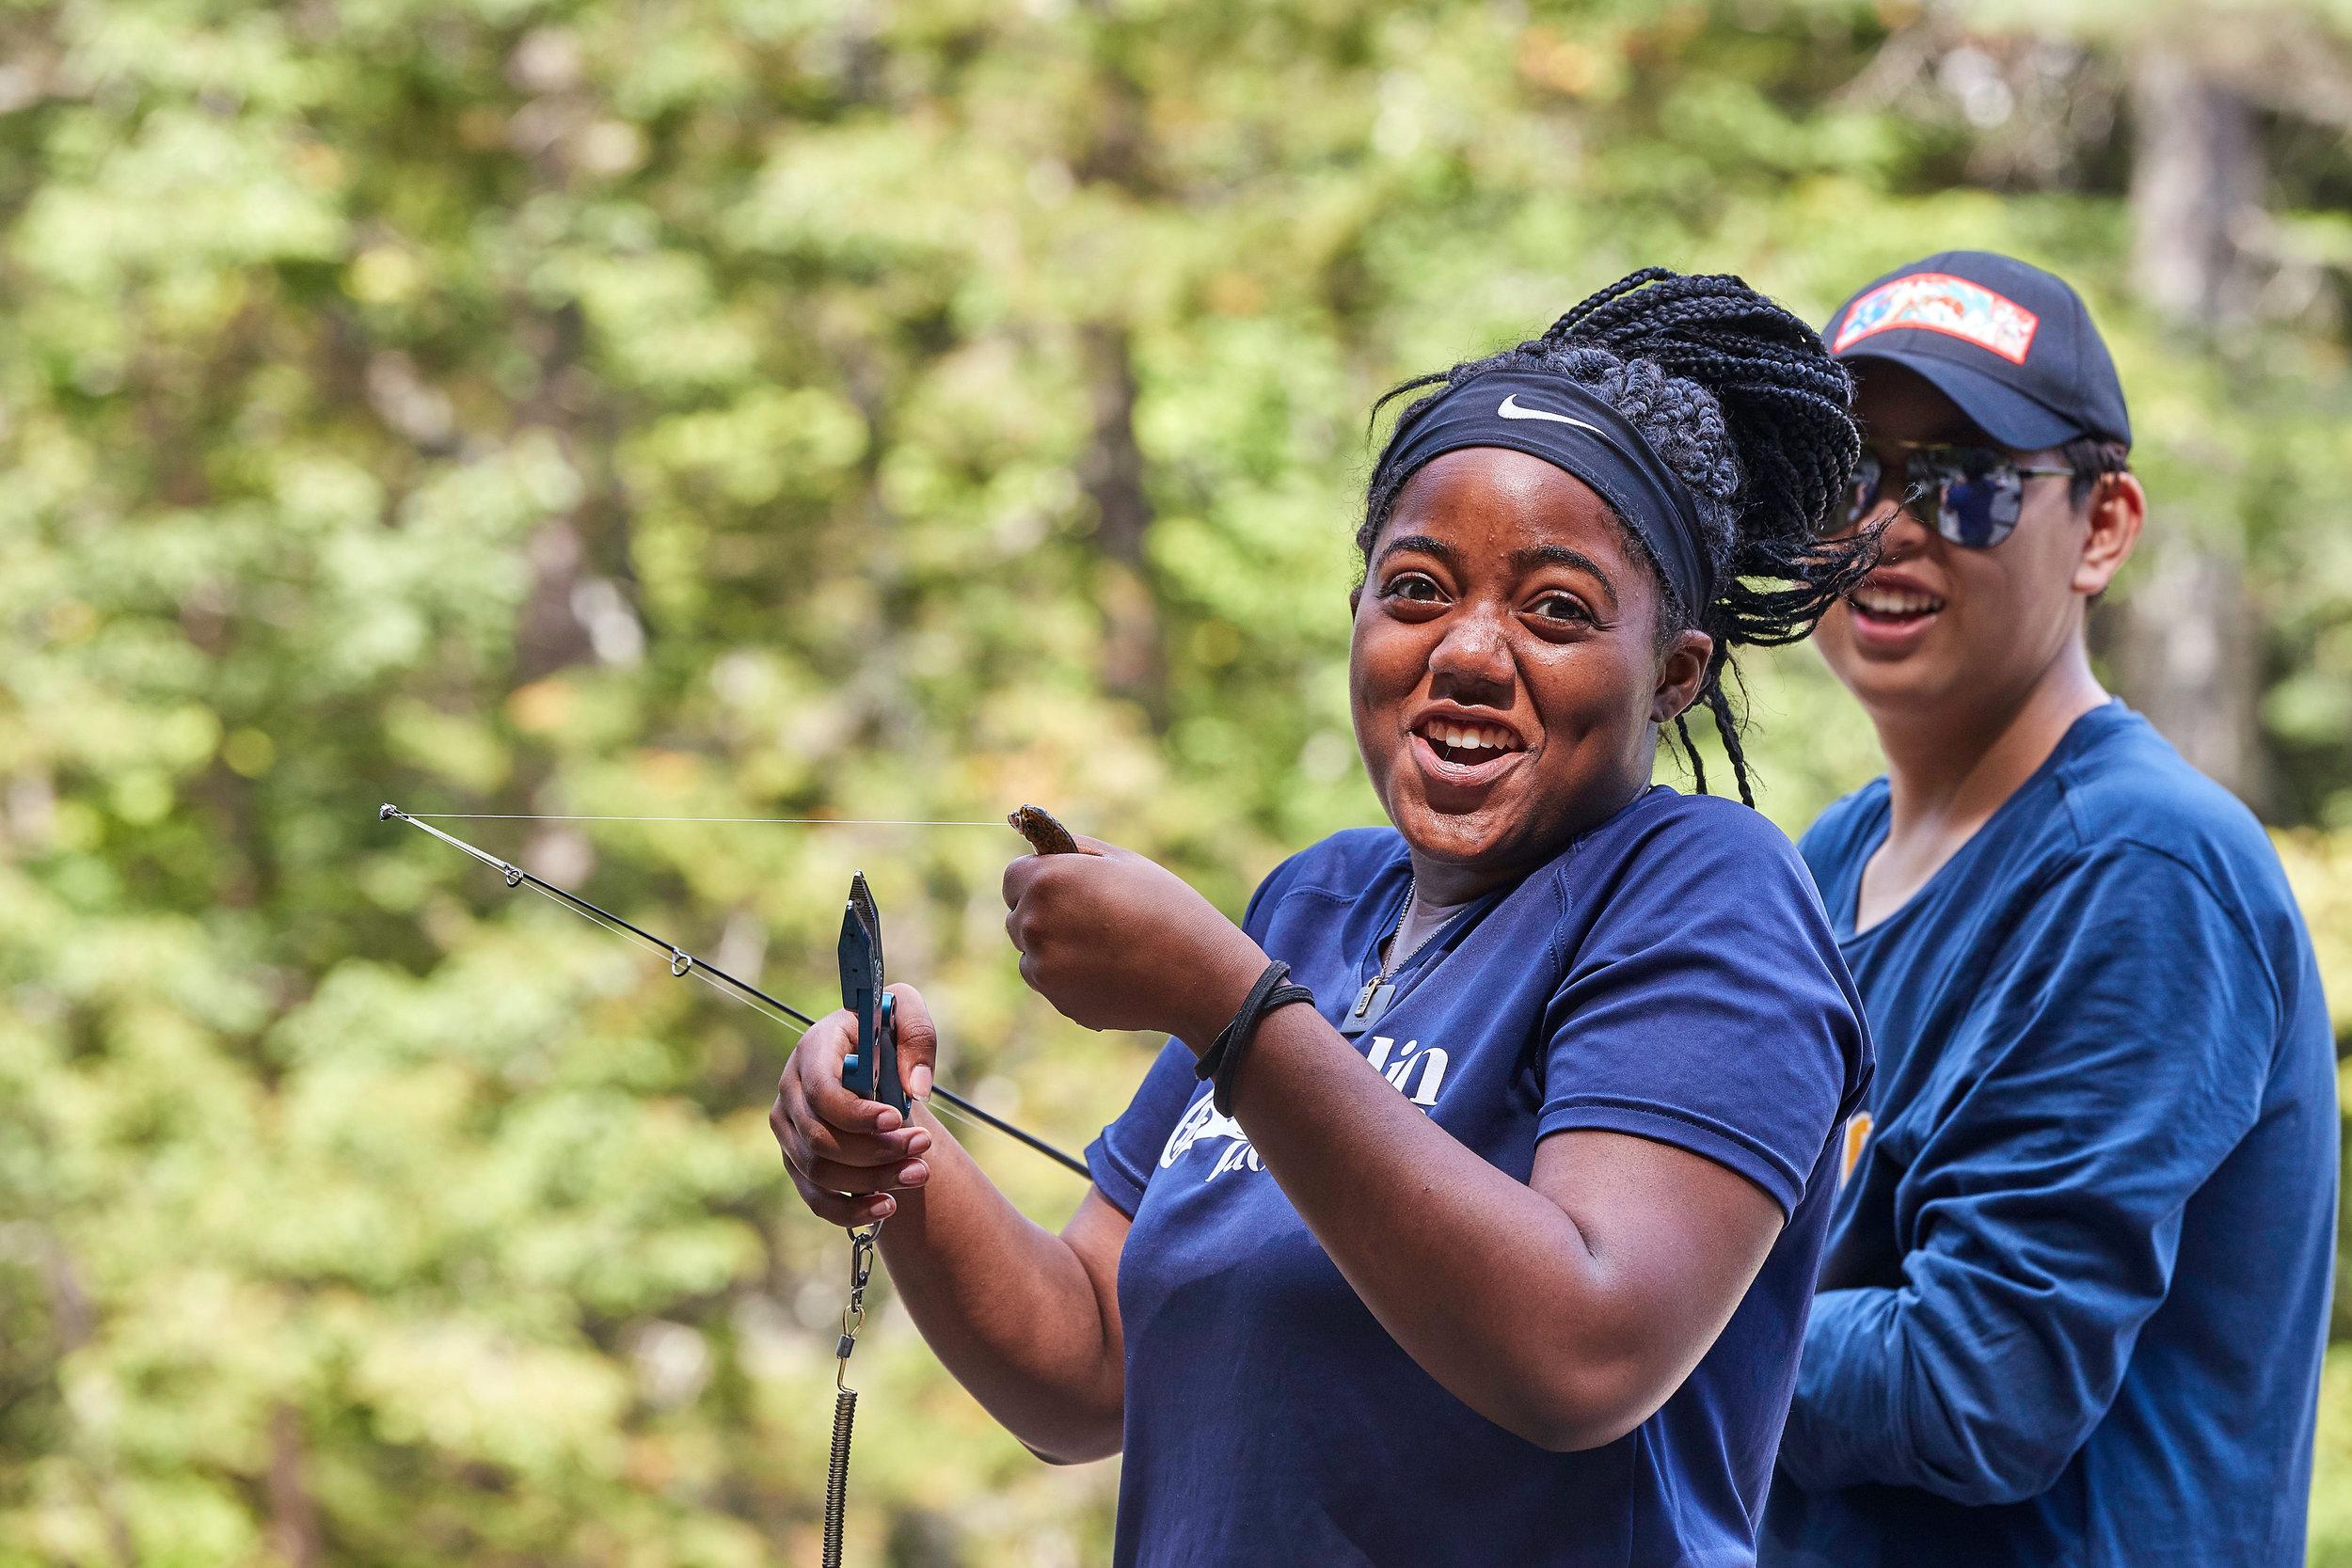 Camping trips 2018 - 118186 - 092-5K.jpg